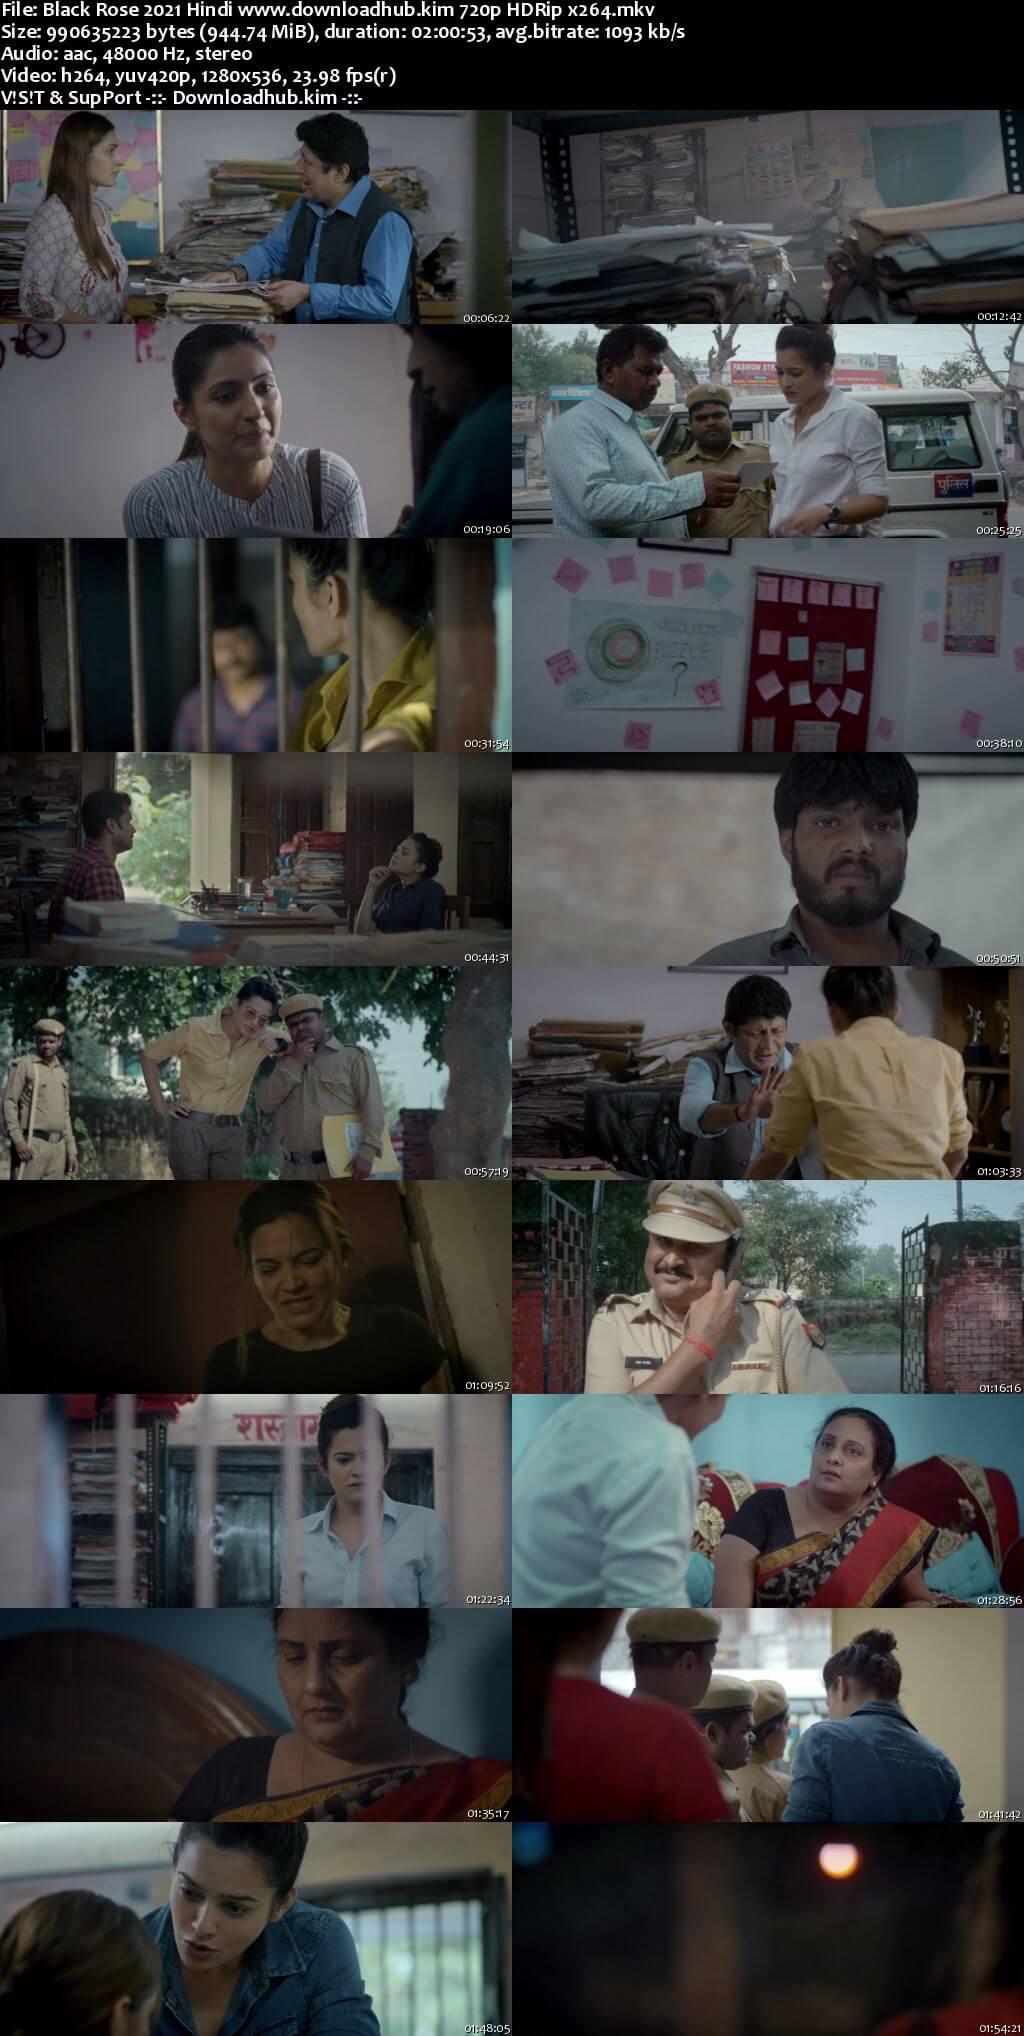 Black Rose 2021 Hindi 720p HDRip x264